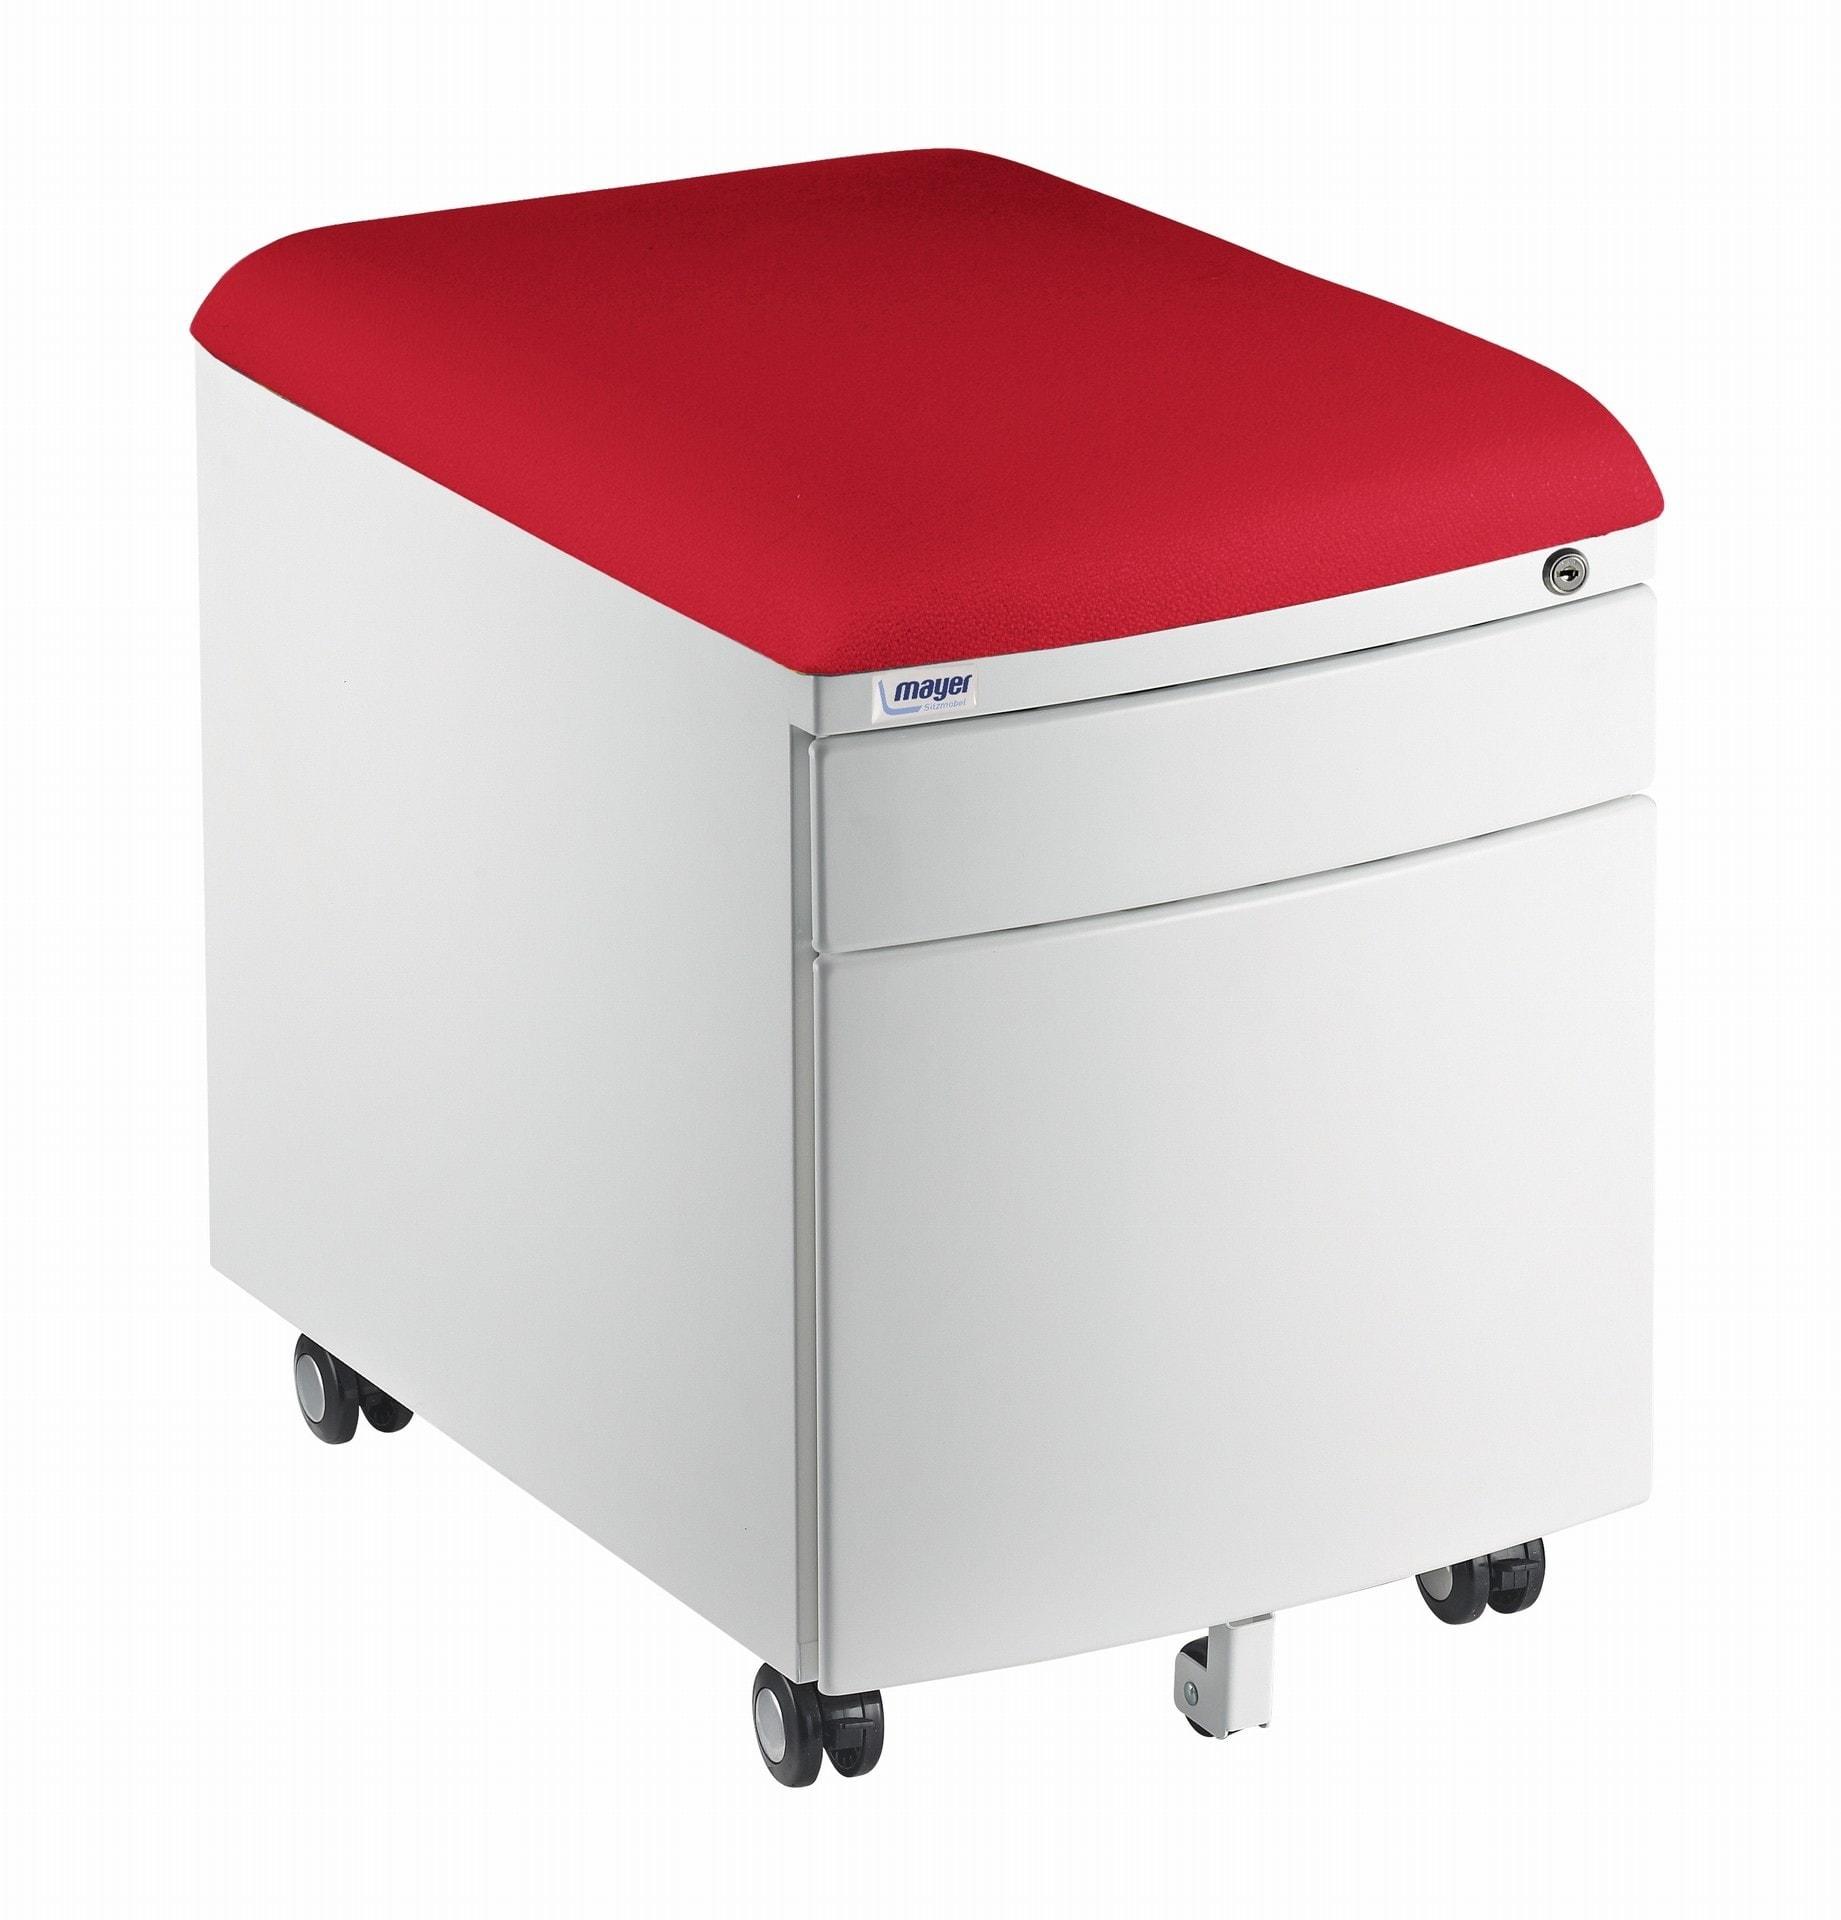 Kontejner Mayer bílý - potah aquaclean červený